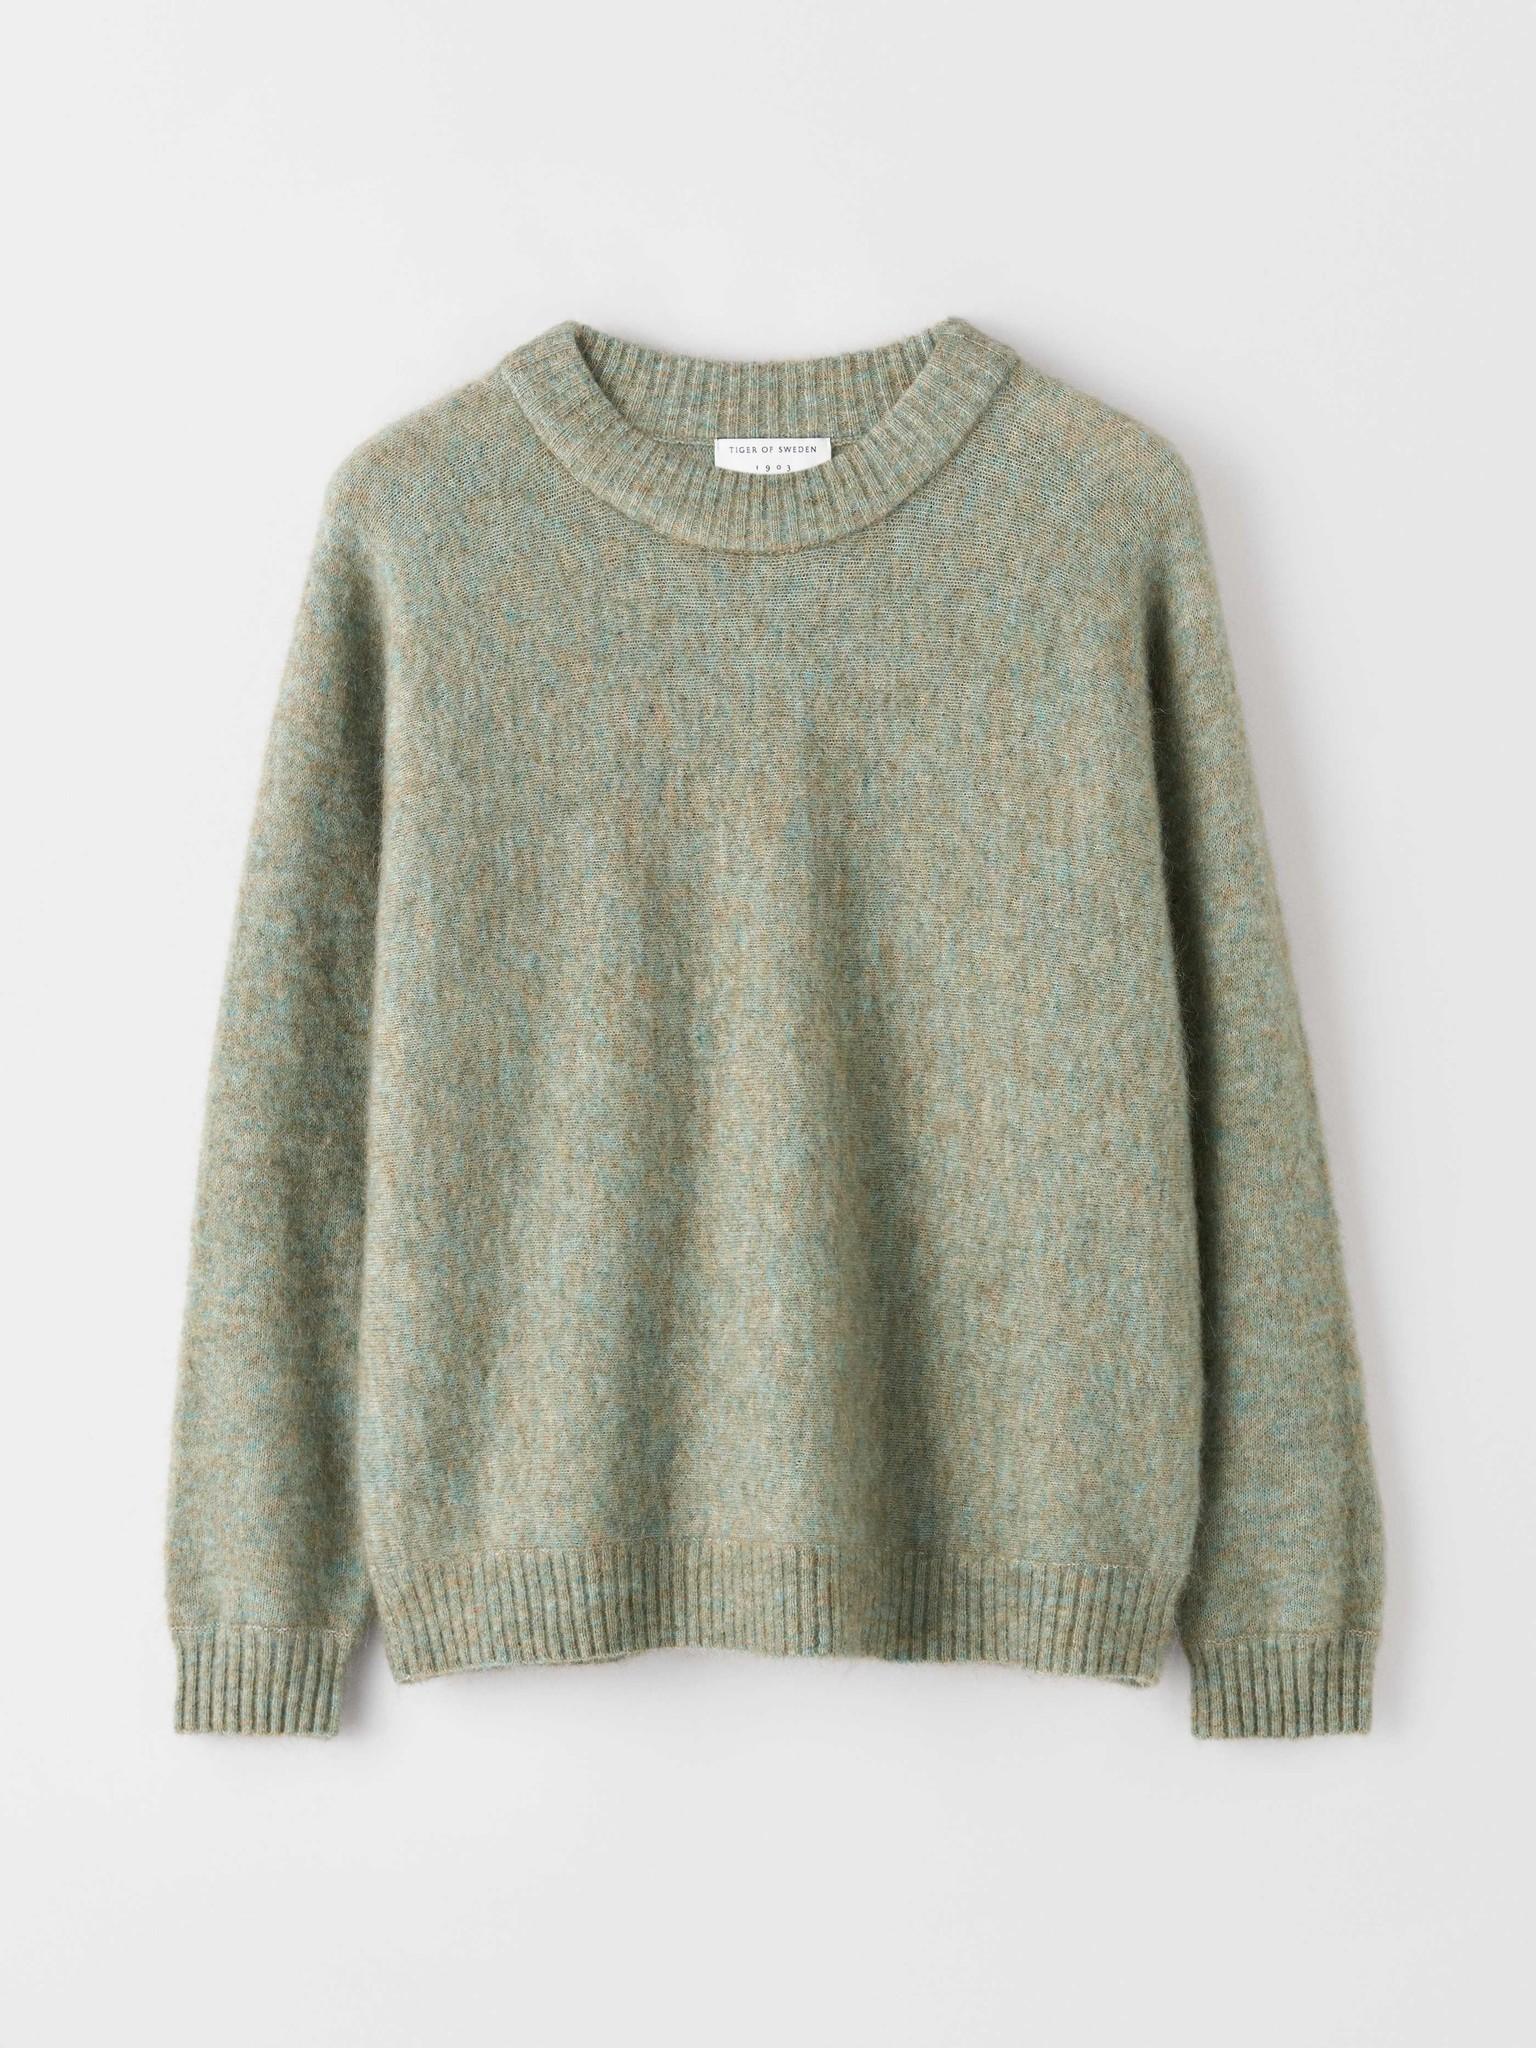 Gwynn Pale Jade Green Wool Knitwear-2